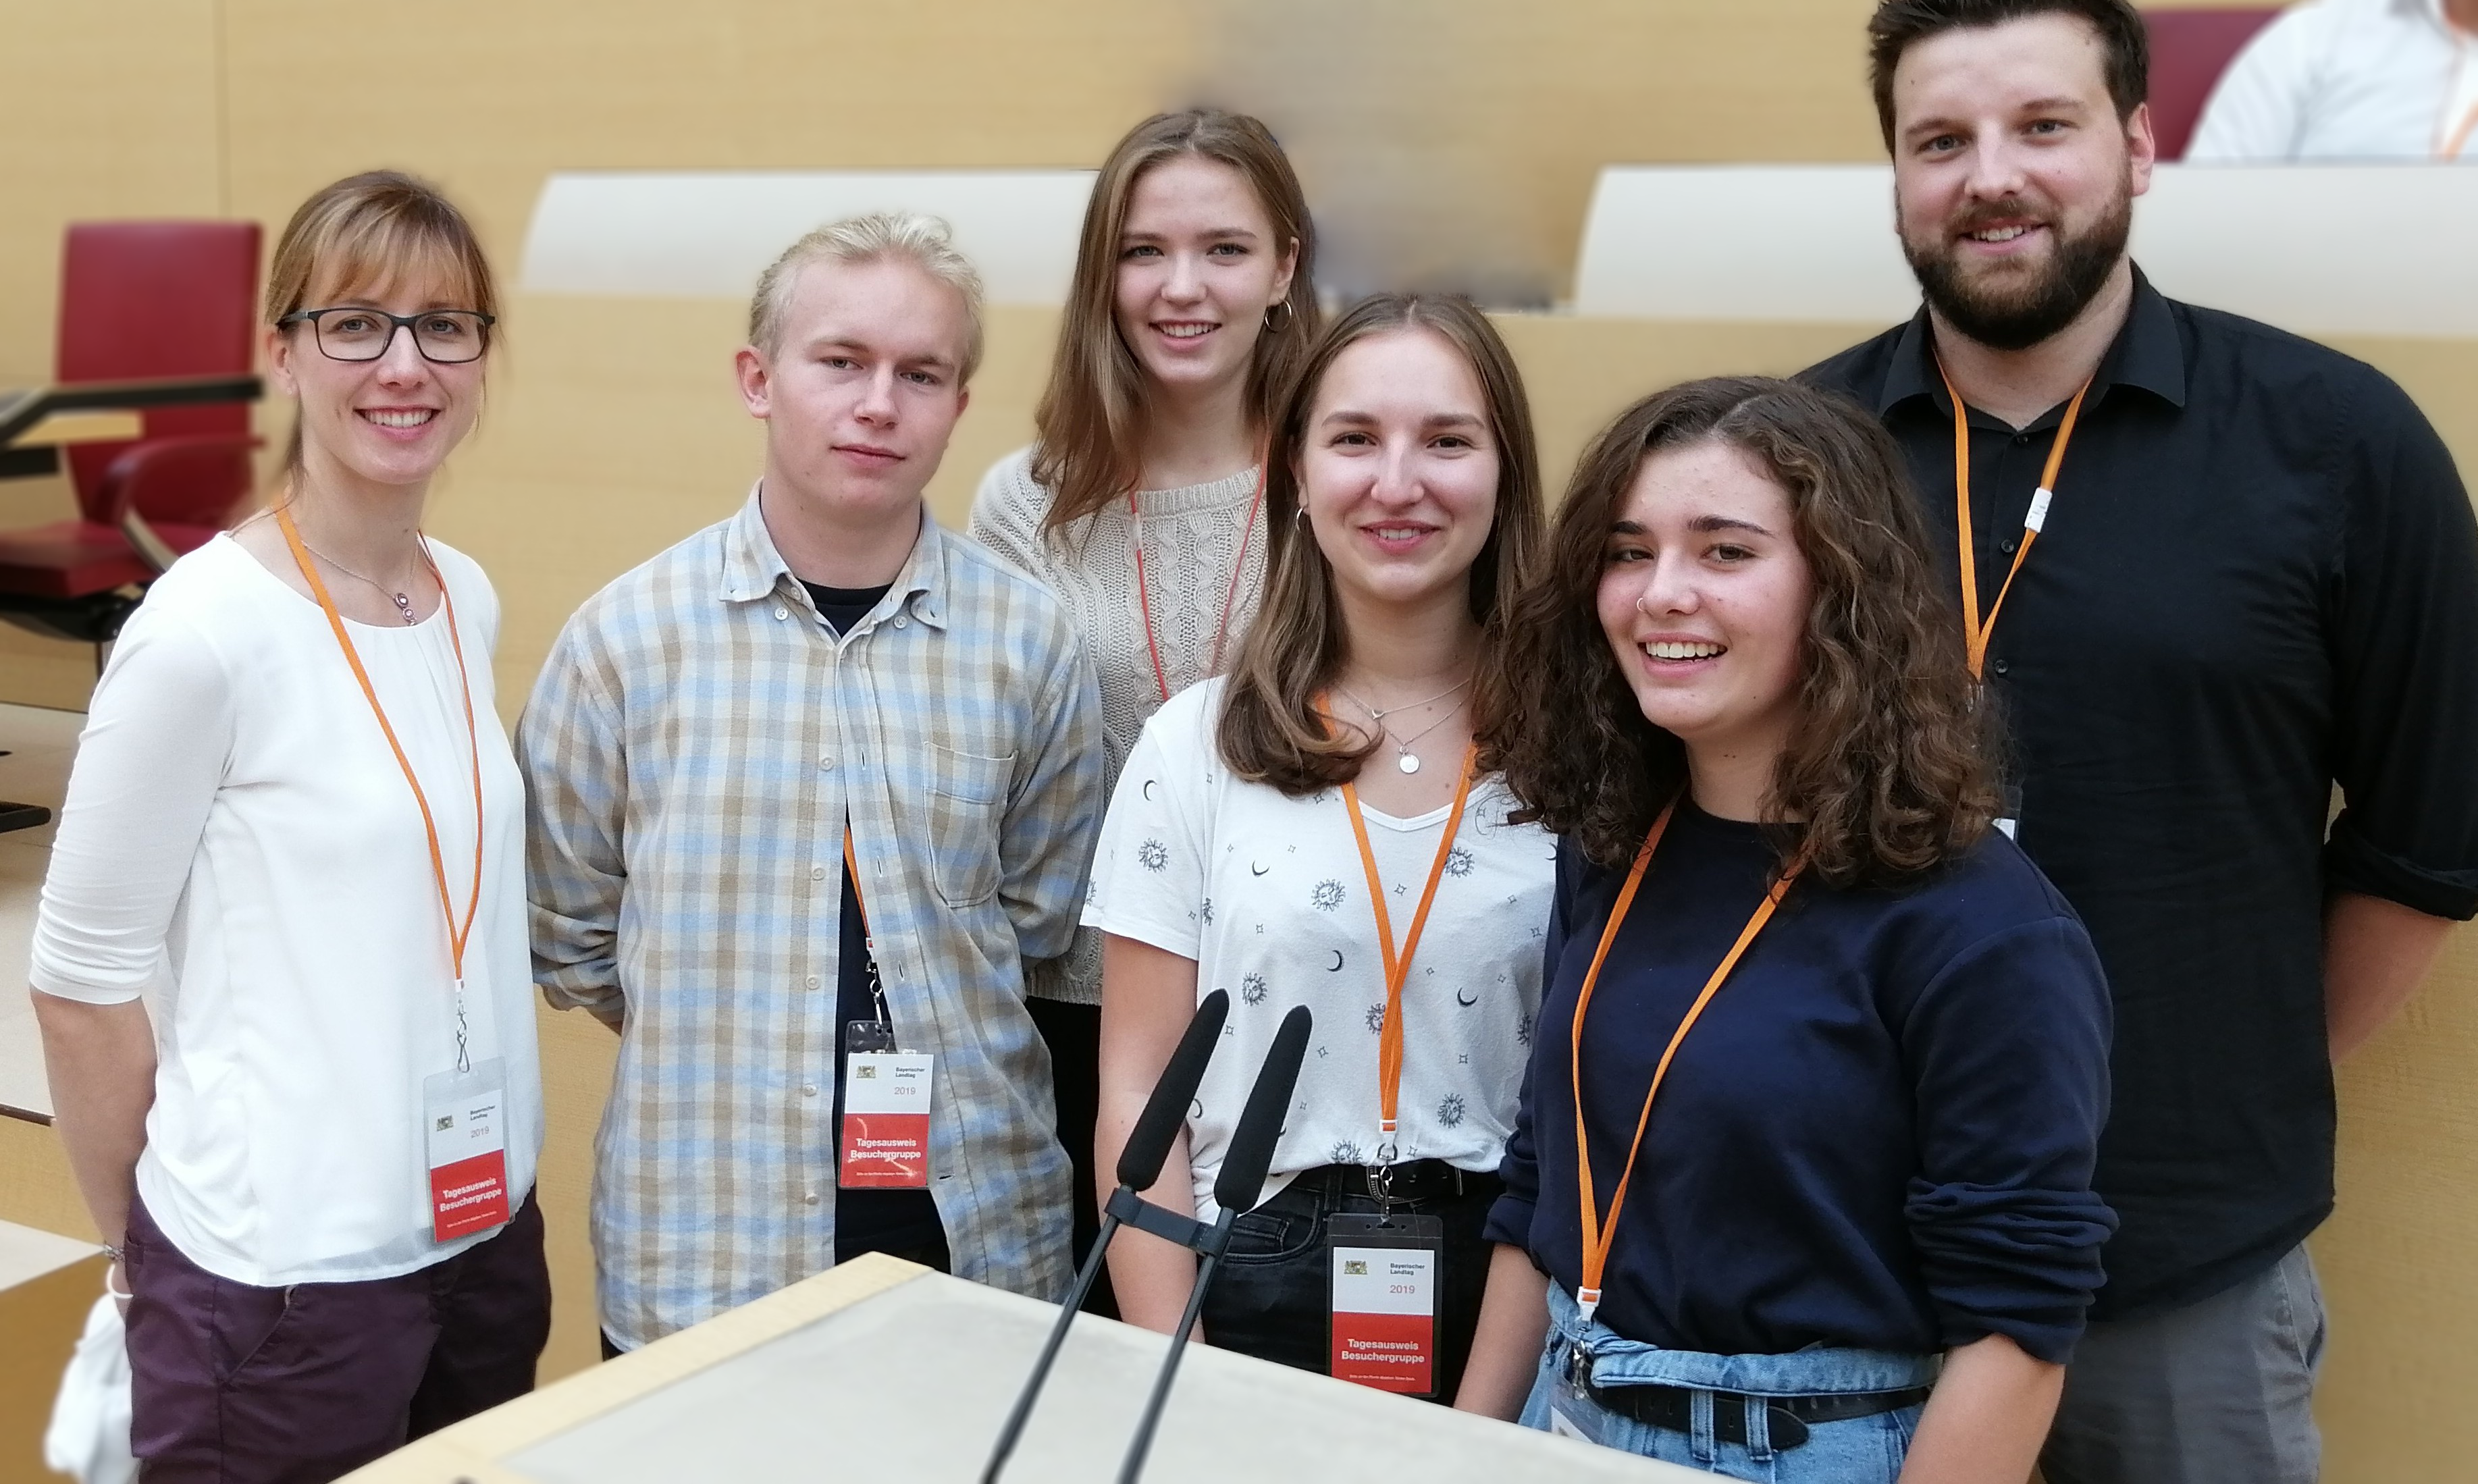 v.l. Diana Emmert, Tilman Kerber, Stefanie Schnellbach, Lisa Klett, Anne Mäckler, Christian Gräb